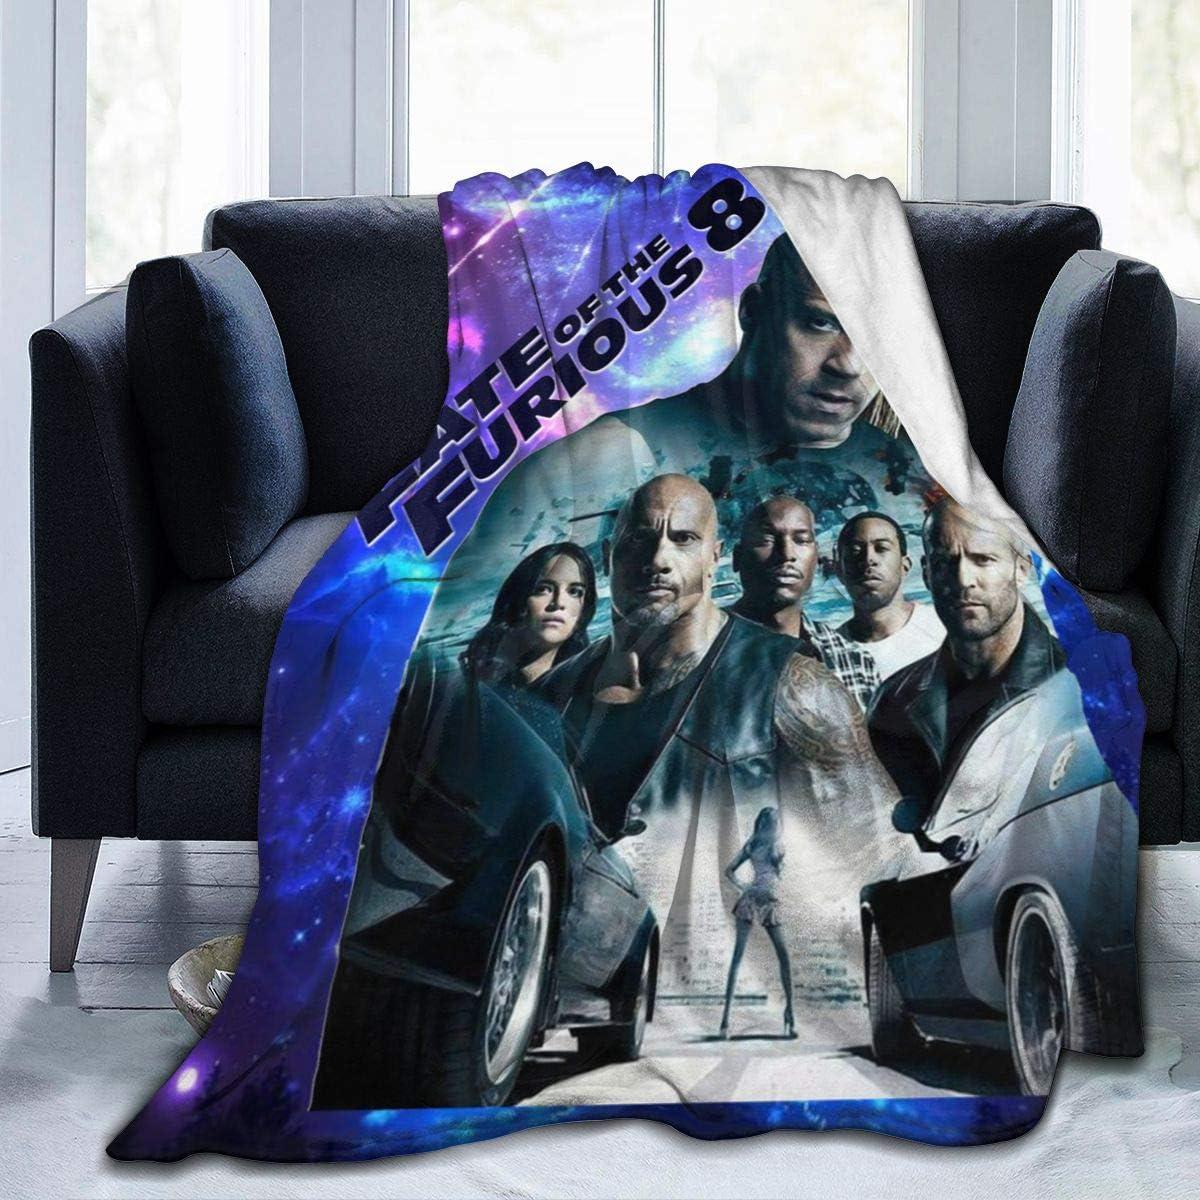 "Melissa Math Ilda Warm Throw Blanket FA-st Fur-ious 3D Printed Super Soft Fuzzy Fleece Blanket Plush Polyester Blanket 60""x50"""